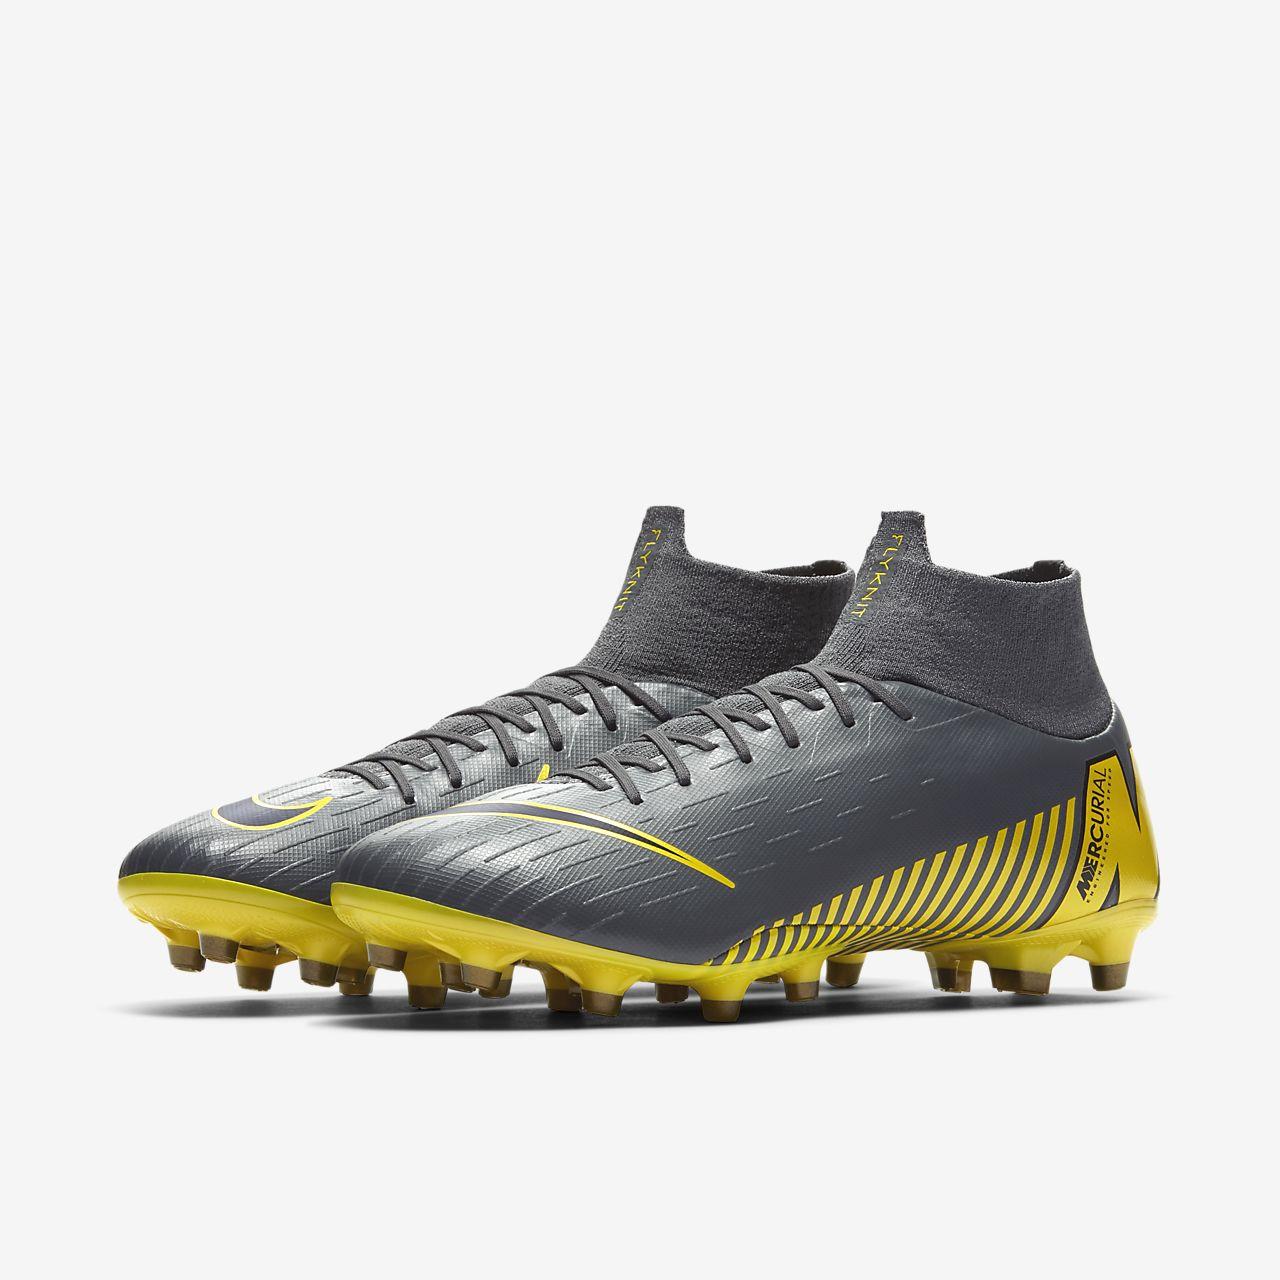 58fd5de5d377 ... Nike Mercurial Superfly VI Pro AG-PRO Botas de fútbol para césped  artificial